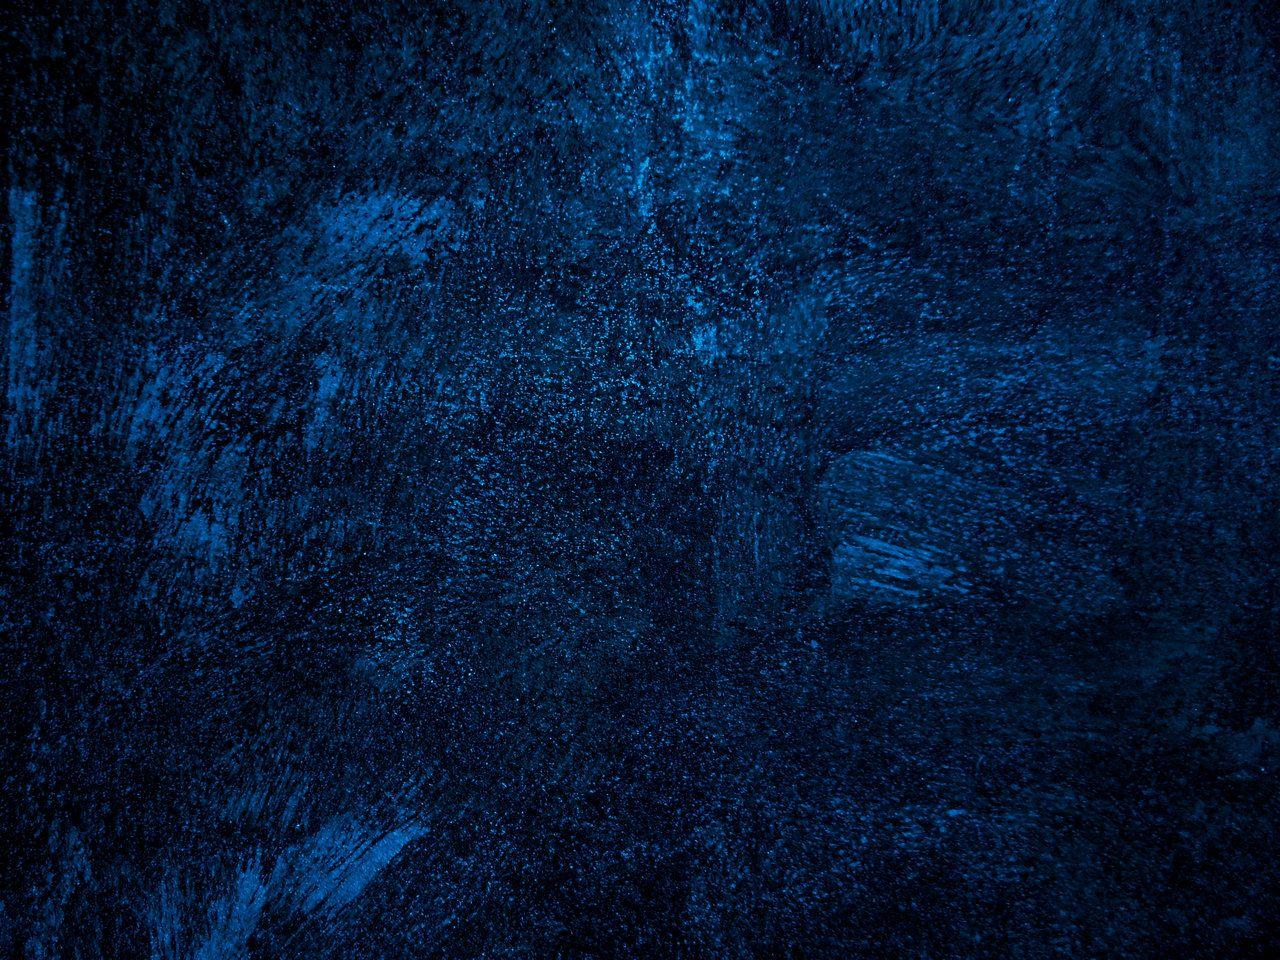 Wallpaper Dark Blue Abstract Painting 163 | Megahdscreen ...